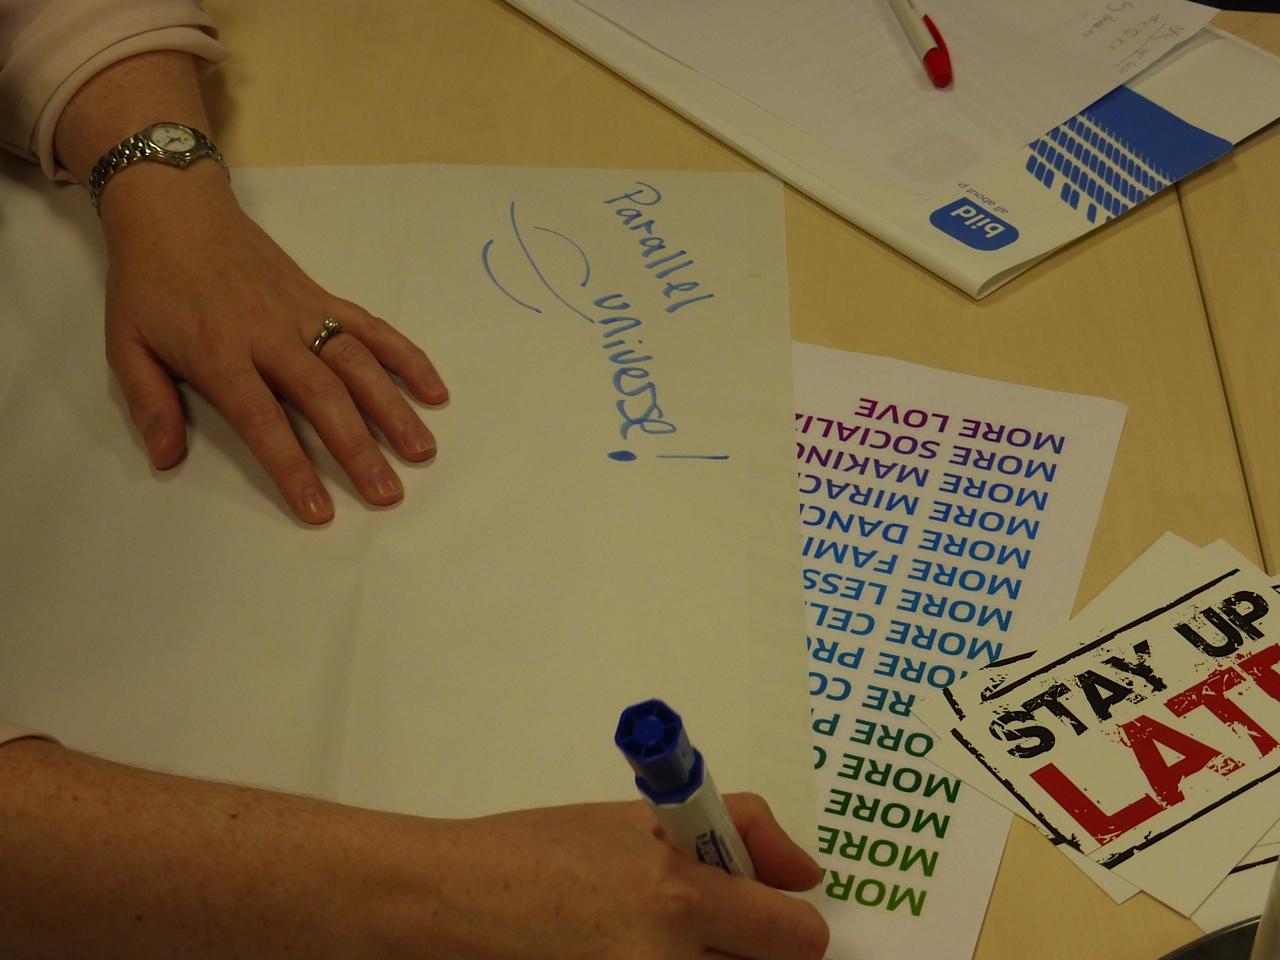 Campaigning workshops